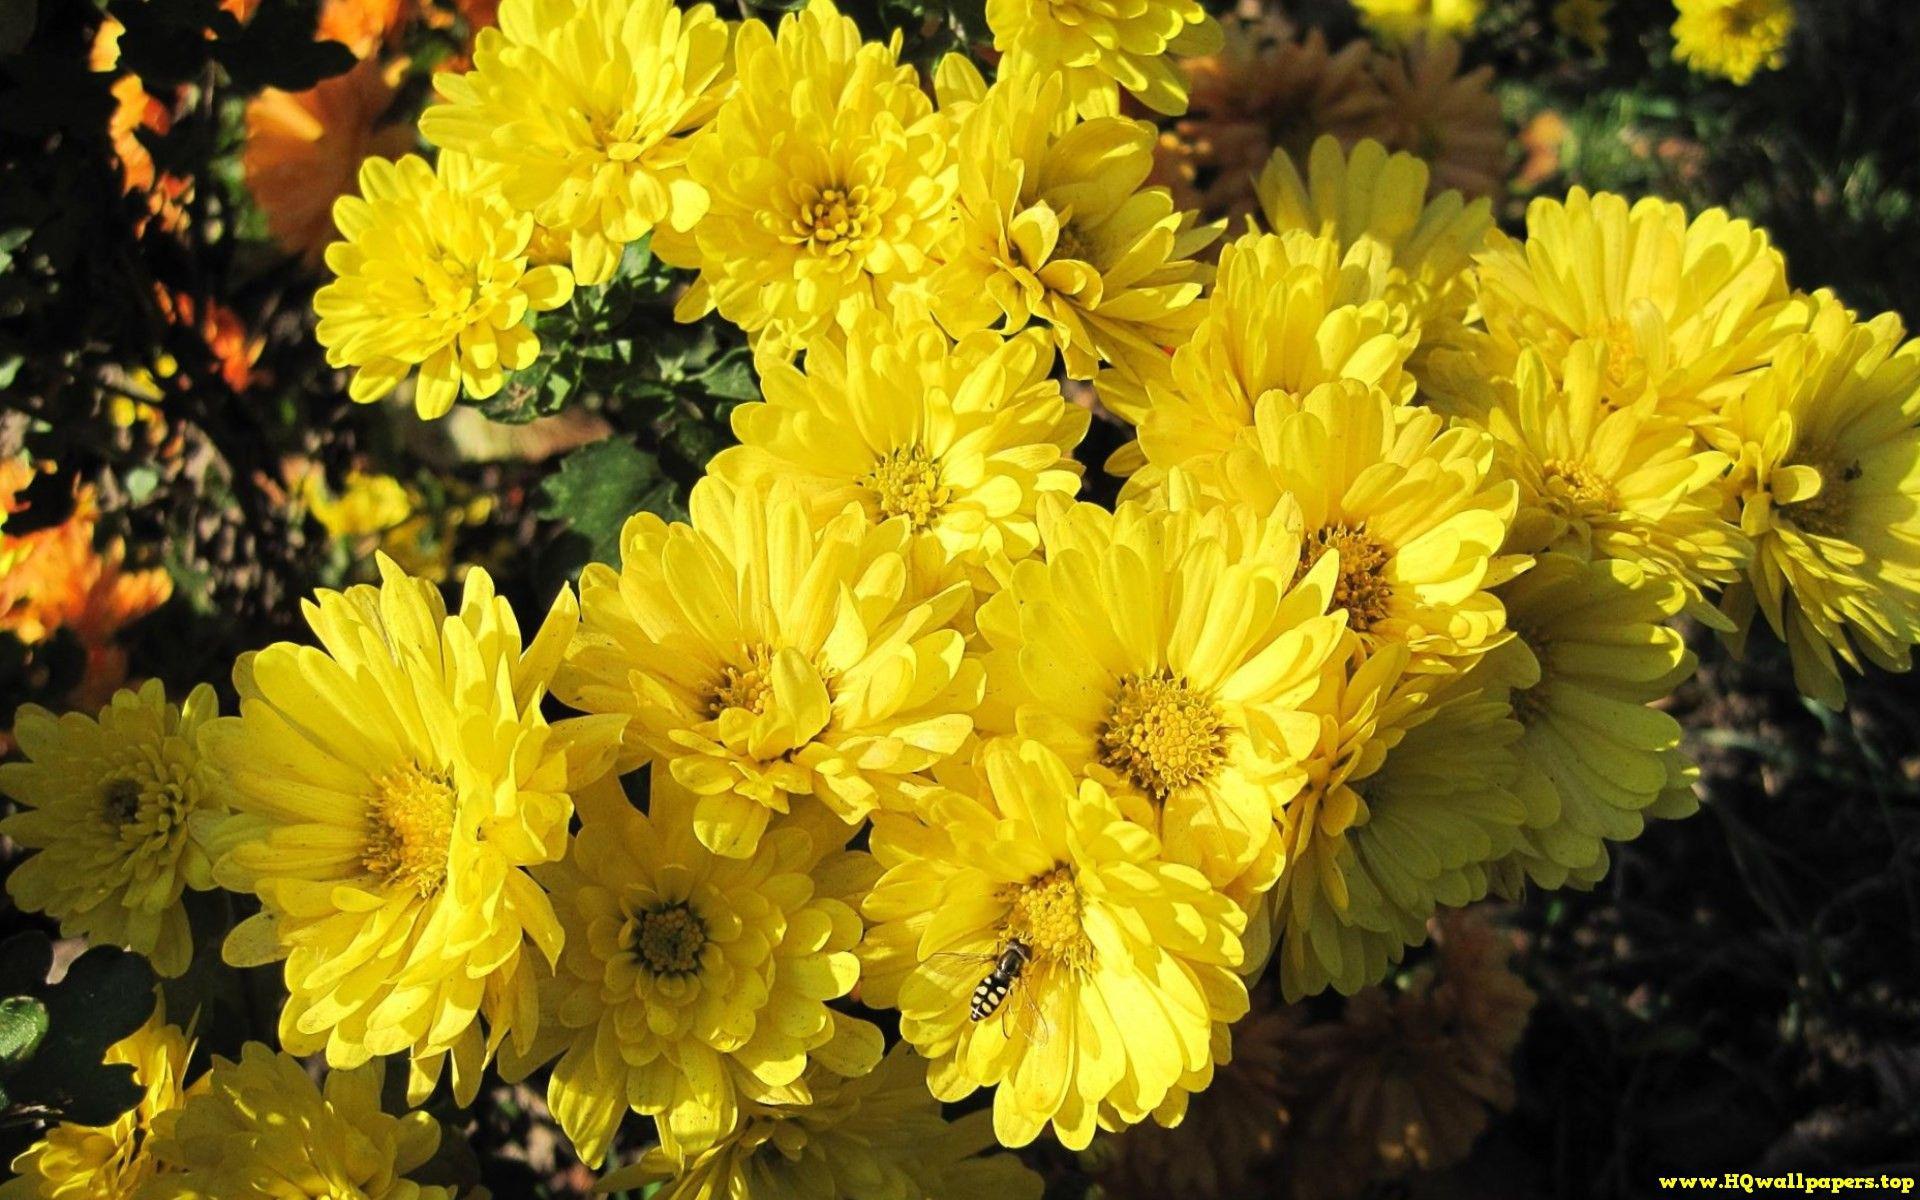 Chrysanthemums HQwallpapersp Pinterest Chrysanthemums